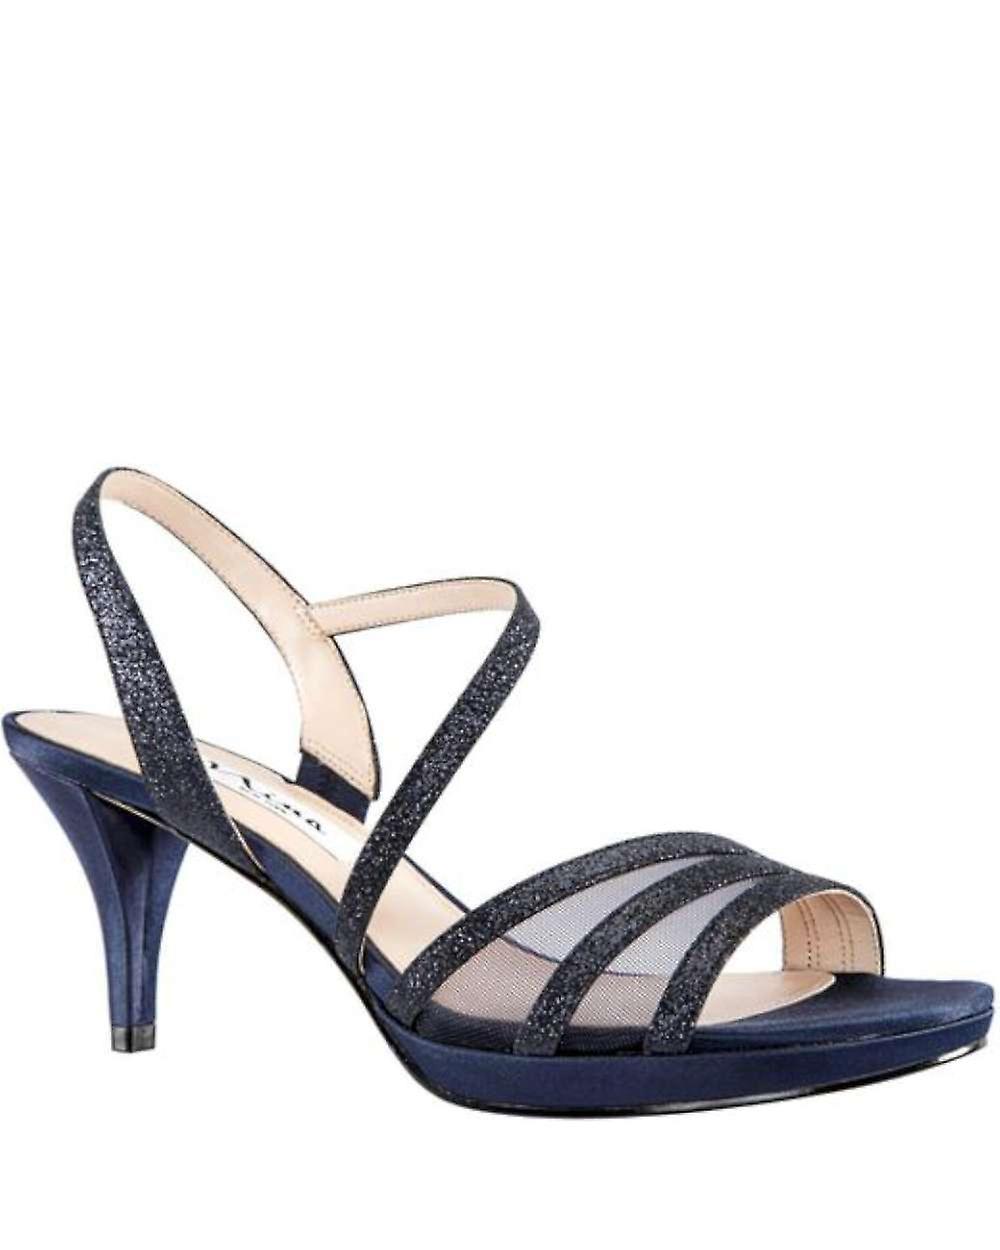 NINA FOOTWEAR Womens Nazima Open Toe Special Occasion Slingback Sandals UfYbR